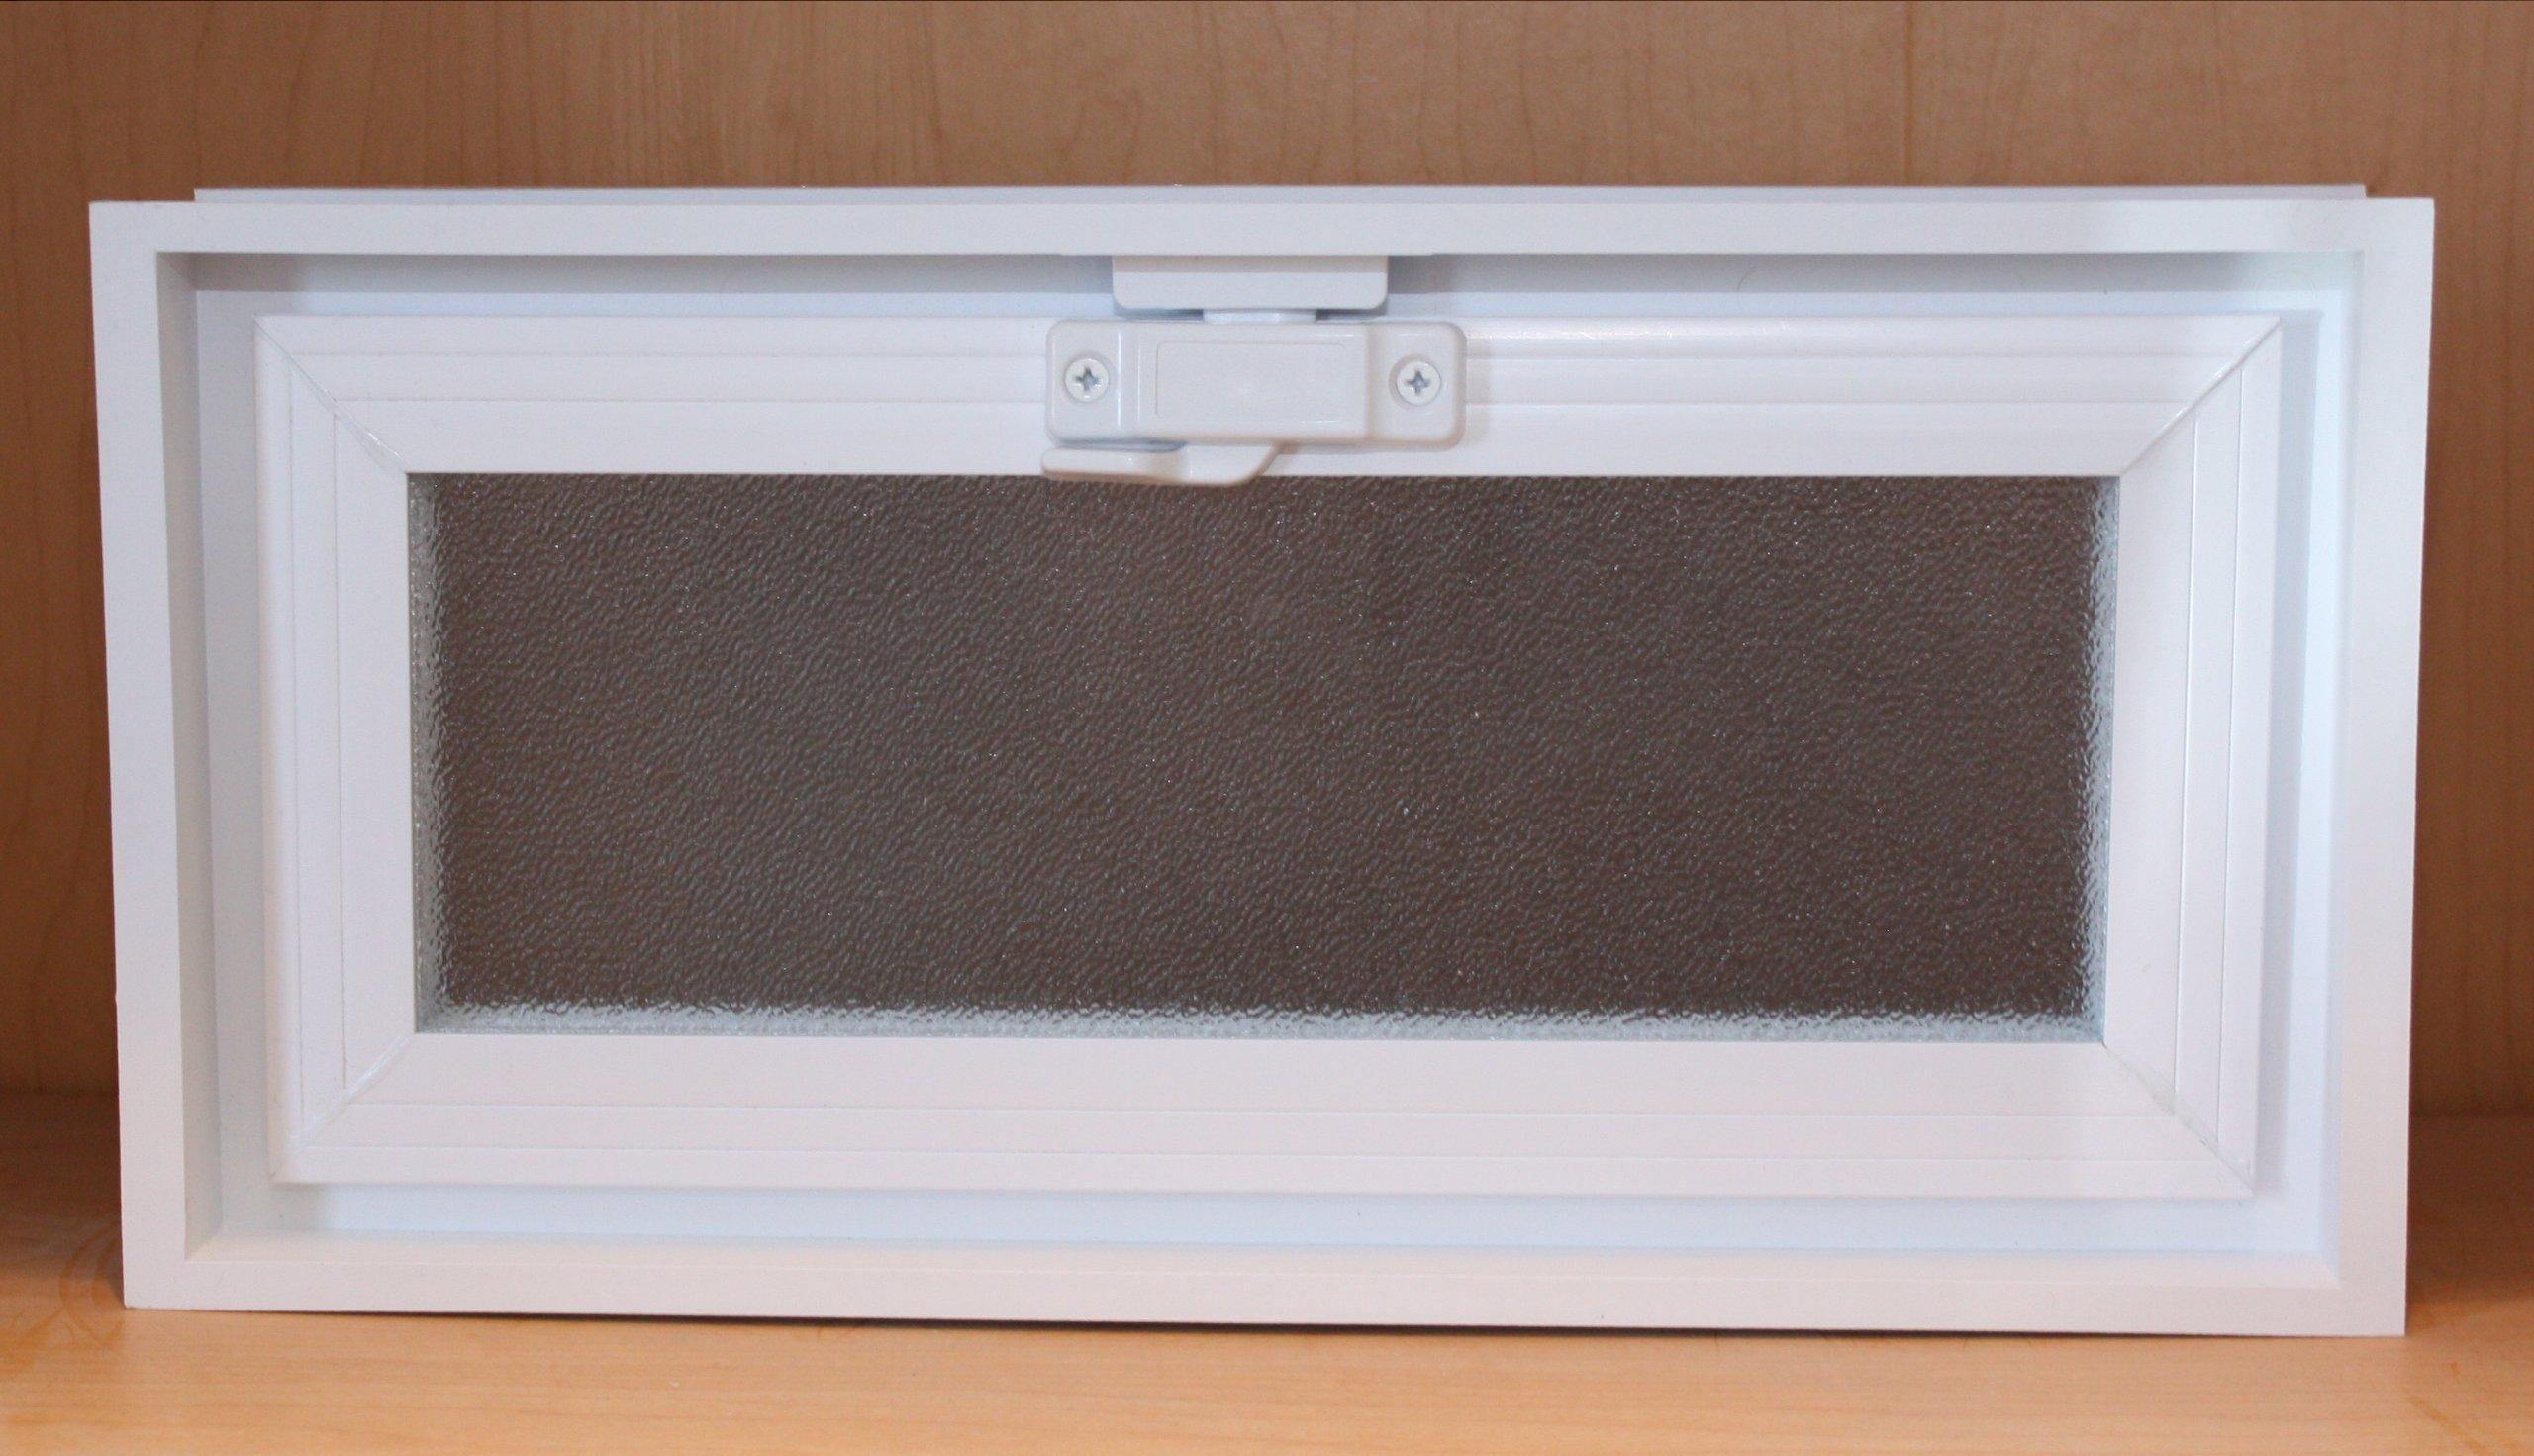 Quality Glass Block 16 x 8 x 3 White Glass Block Vents